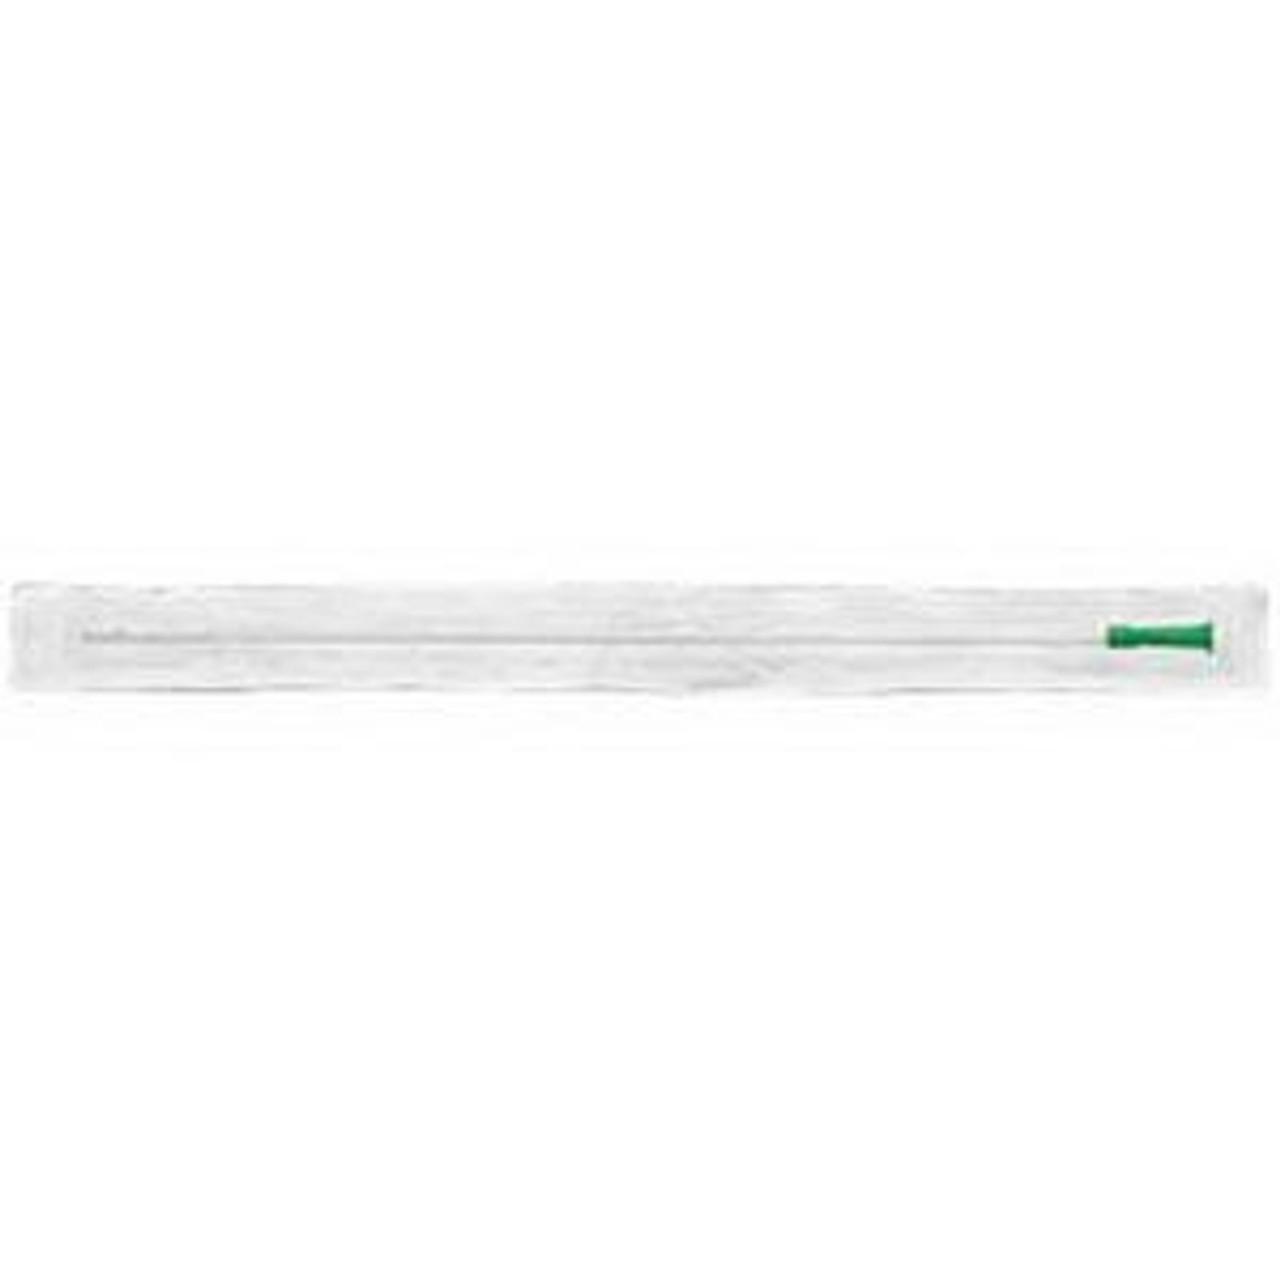 "Hollister Apogee Essentials Apogee IC Intermittent Catheter - 6"""